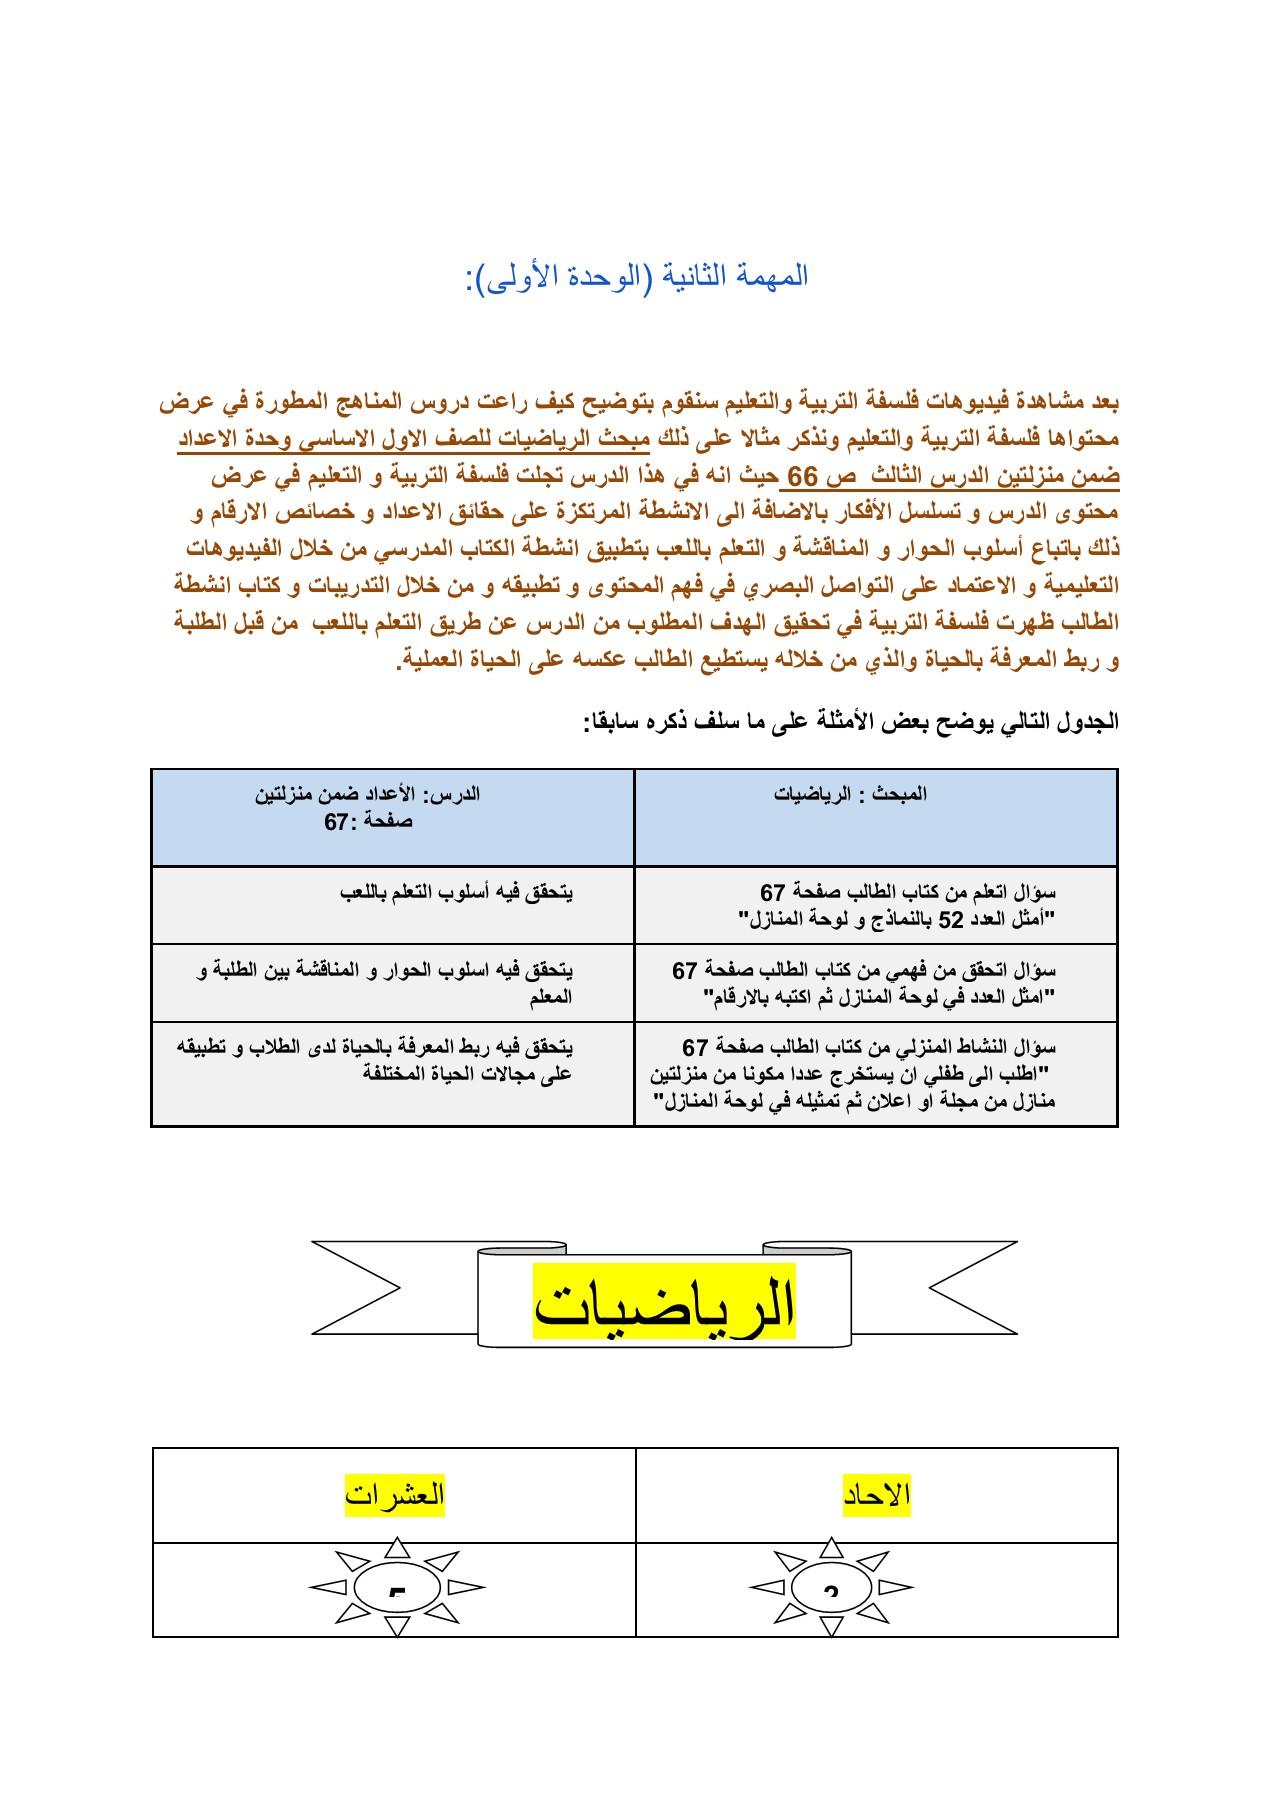 ملف إنجاز رائده توفيق أحمد الطراونه Flip Book Pages 1 32 Pubhtml5